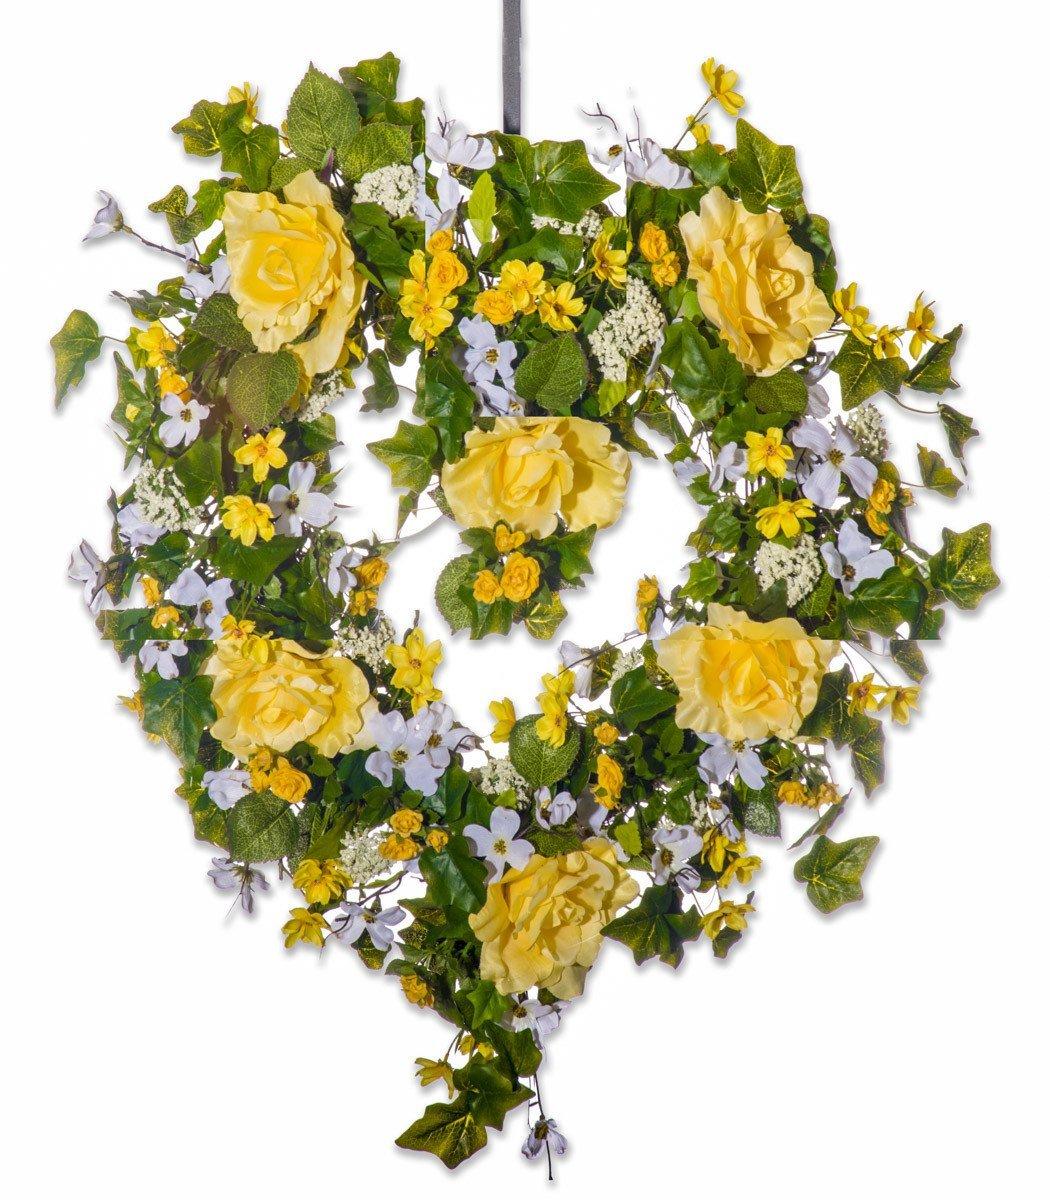 Sunny Heart Yellow Rose Silk Wreath - Valentine's Day, Anniversary or Everyday Wreath